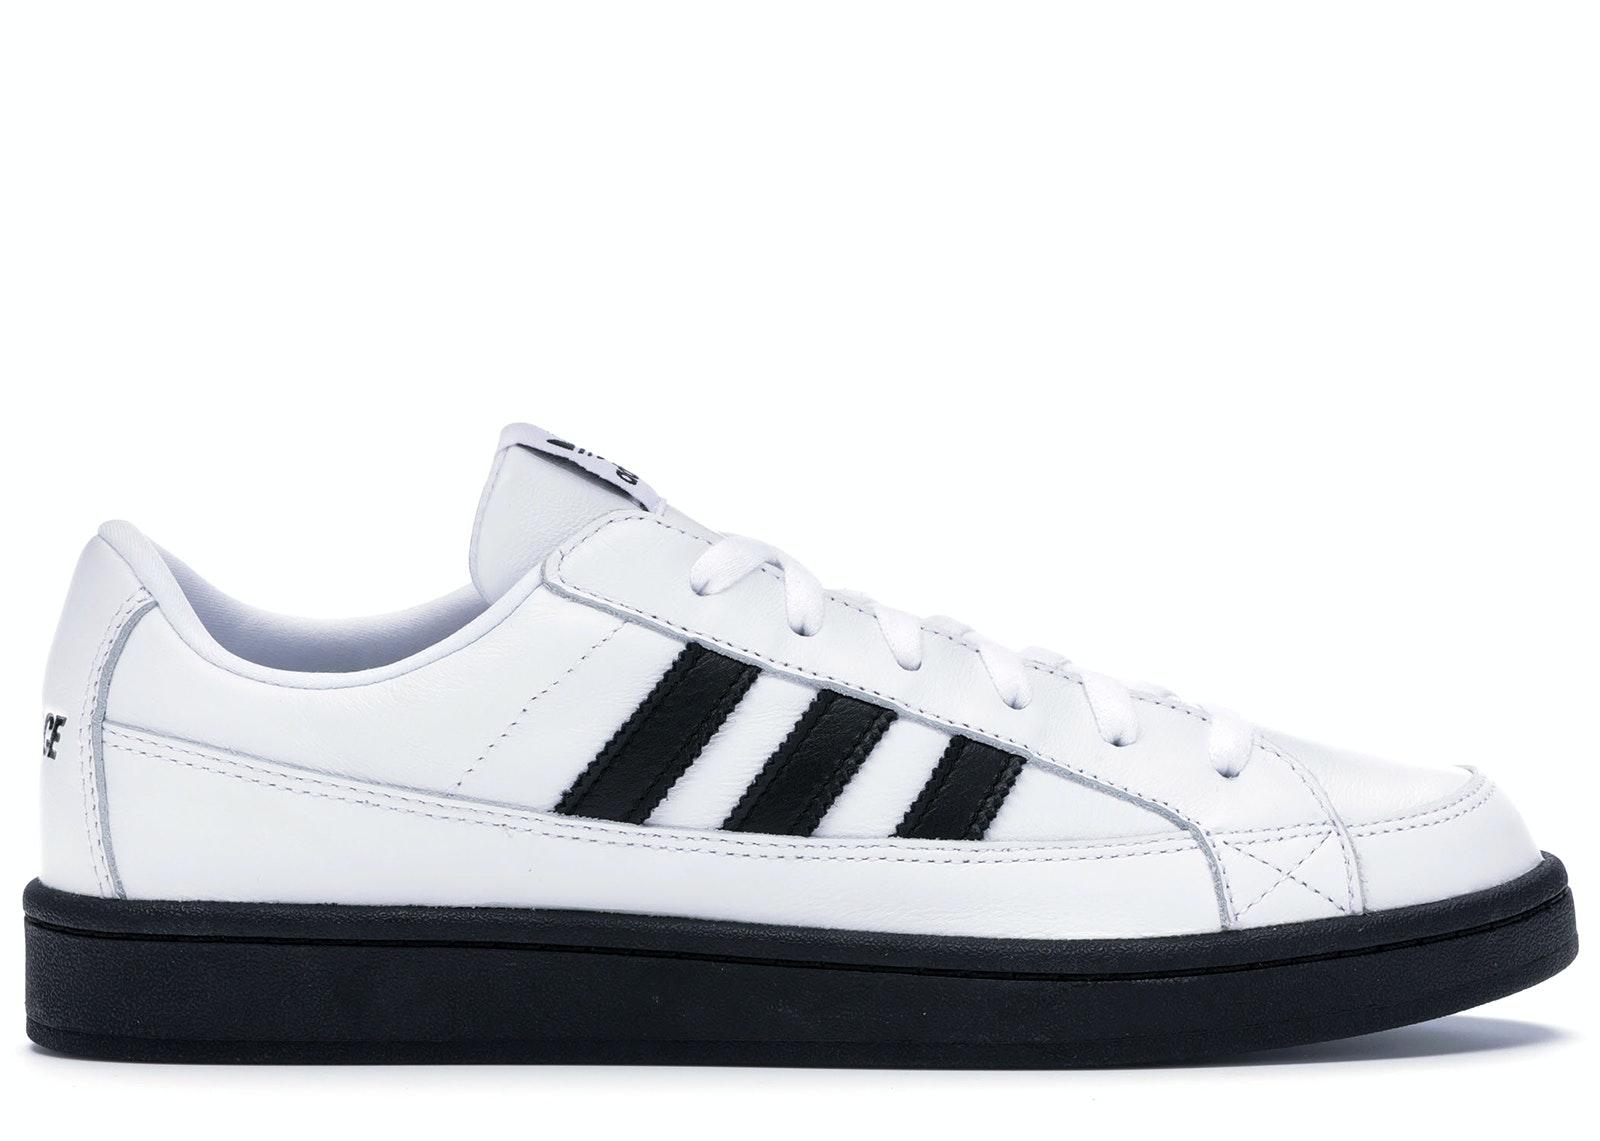 adidas Camton Trainer Palace White